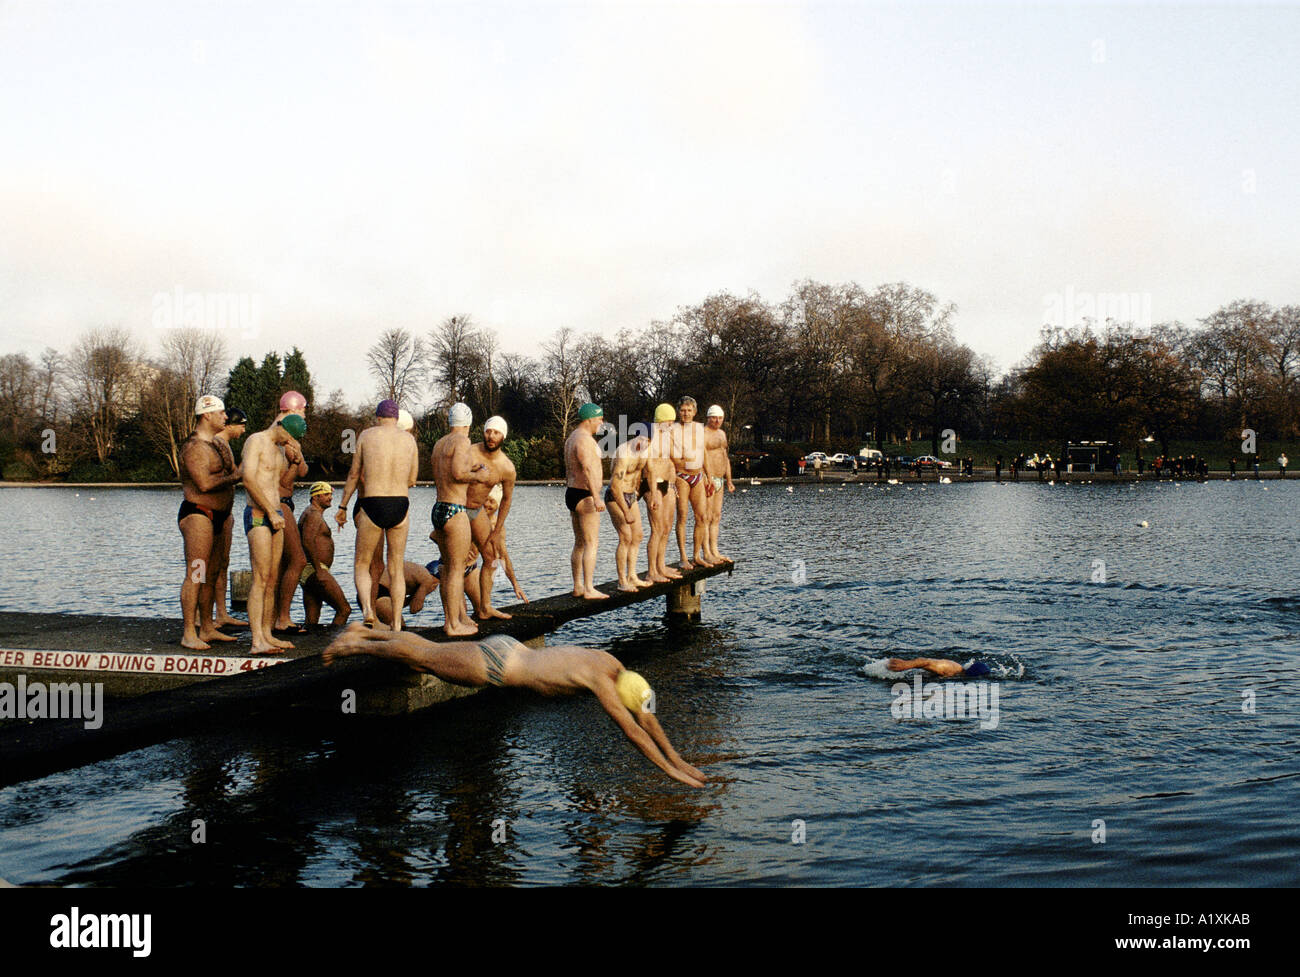 Pics of 30 women naked